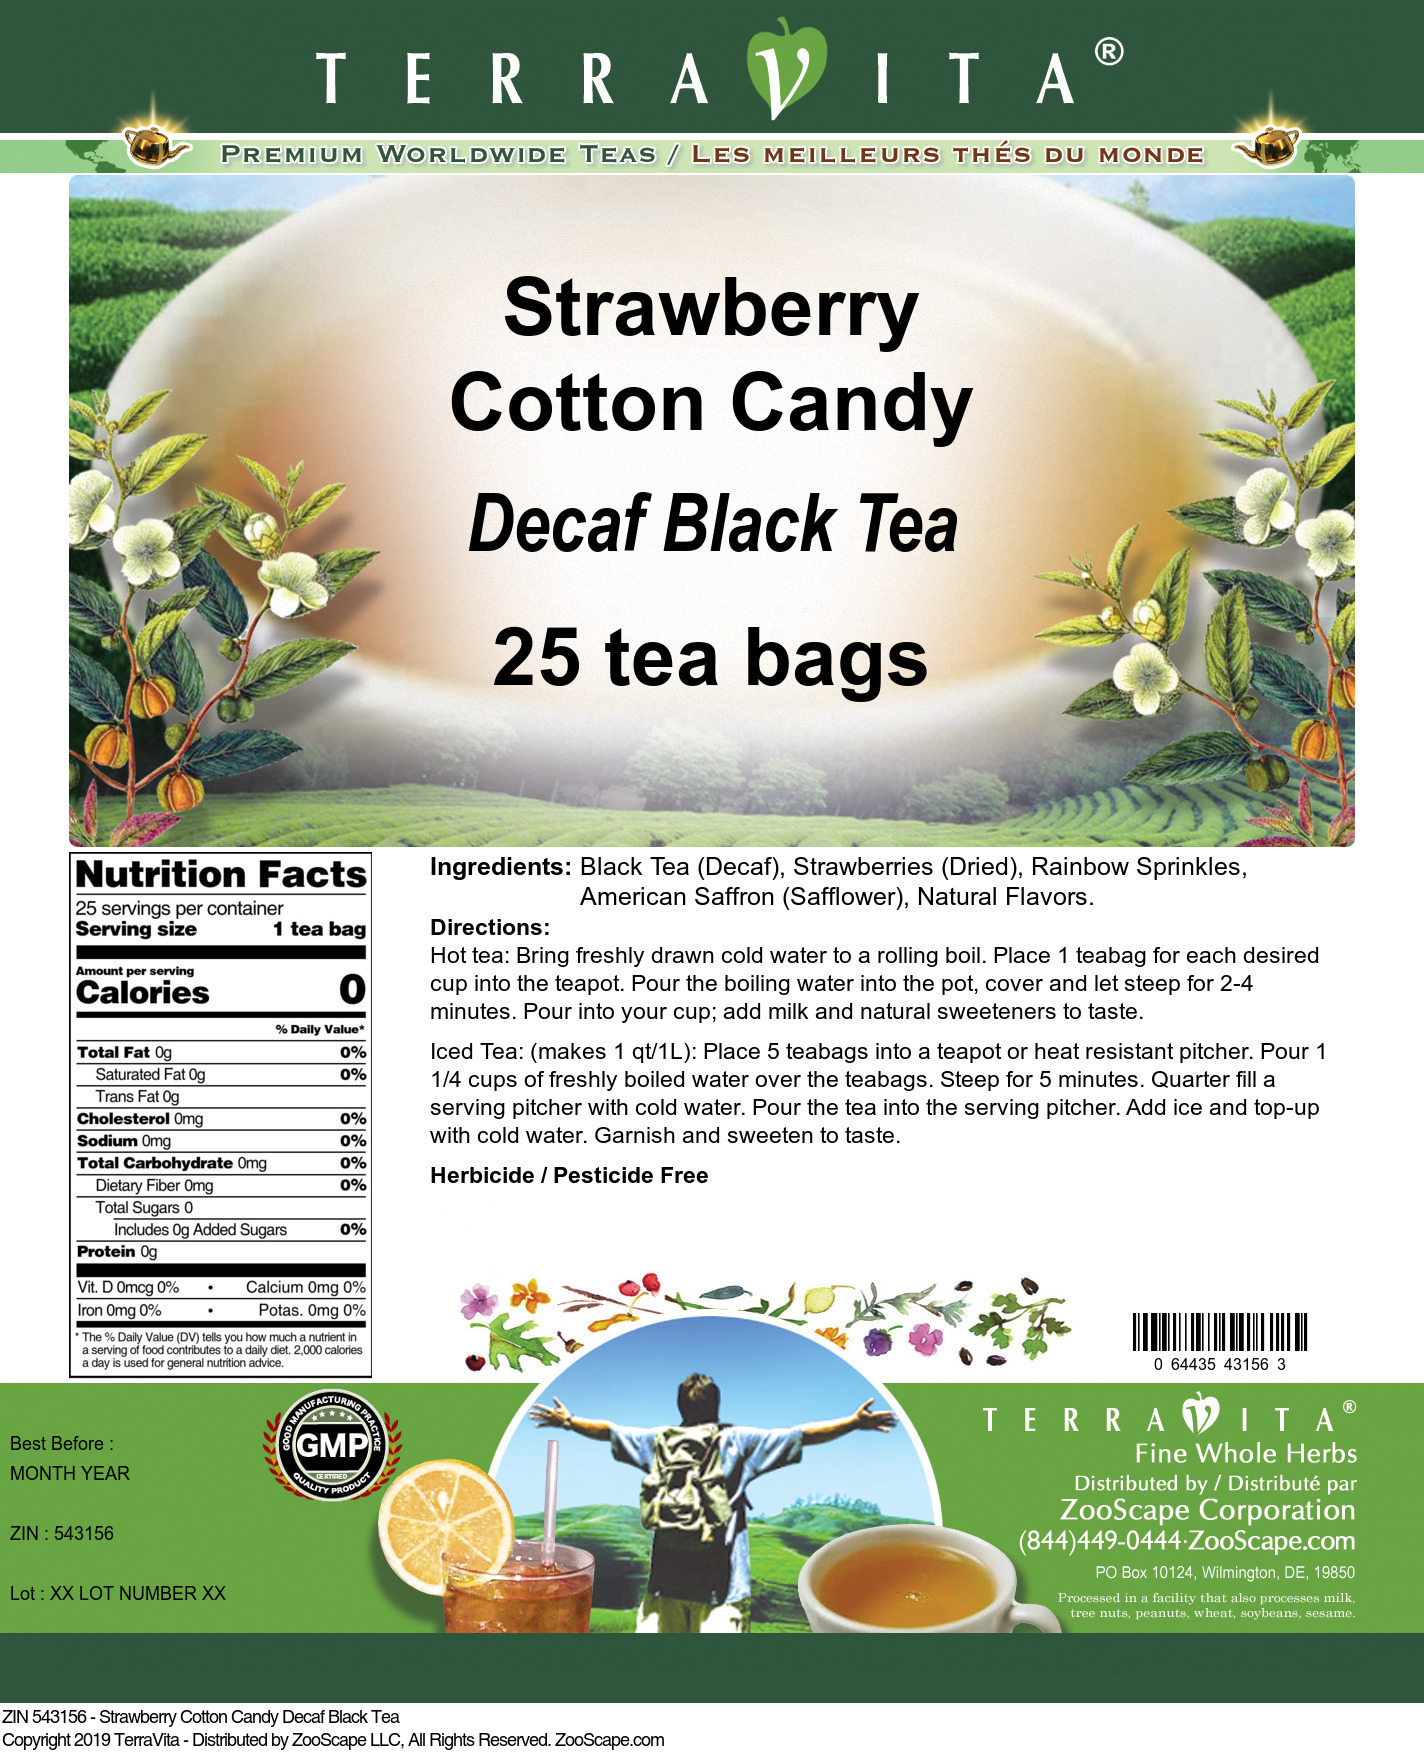 Strawberry Cotton Candy Decaf Black Tea